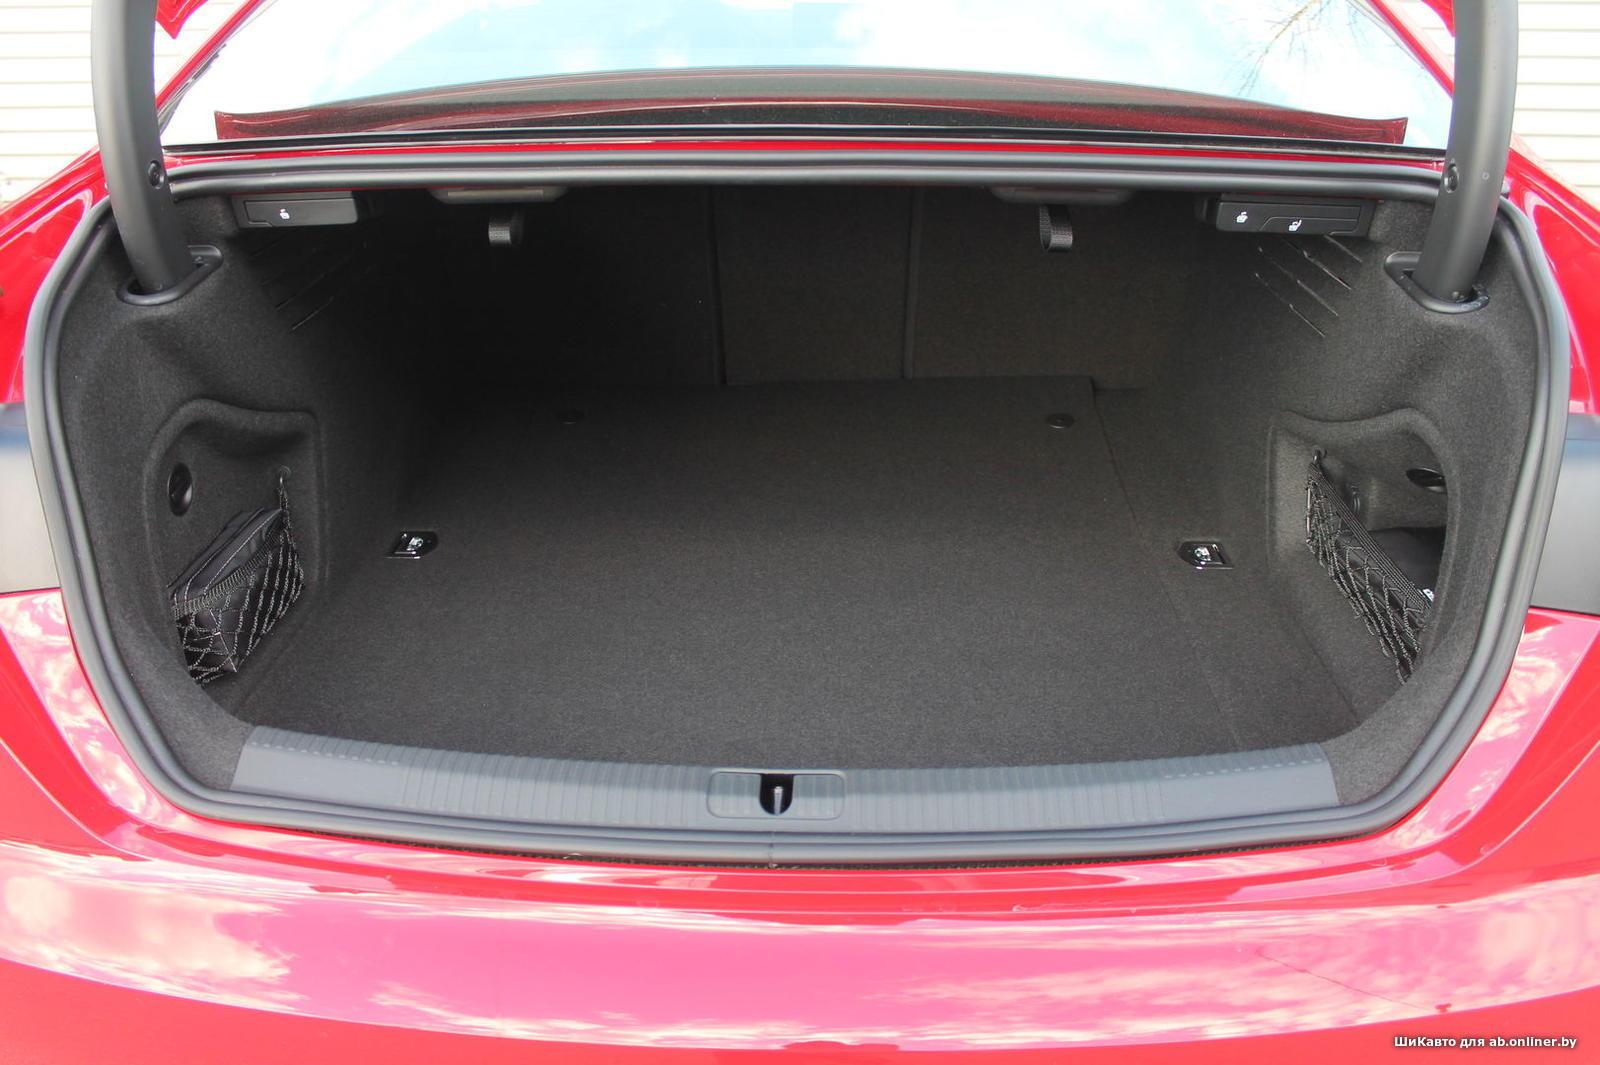 Audi A5 Coupe 2.0 TFSI quattro